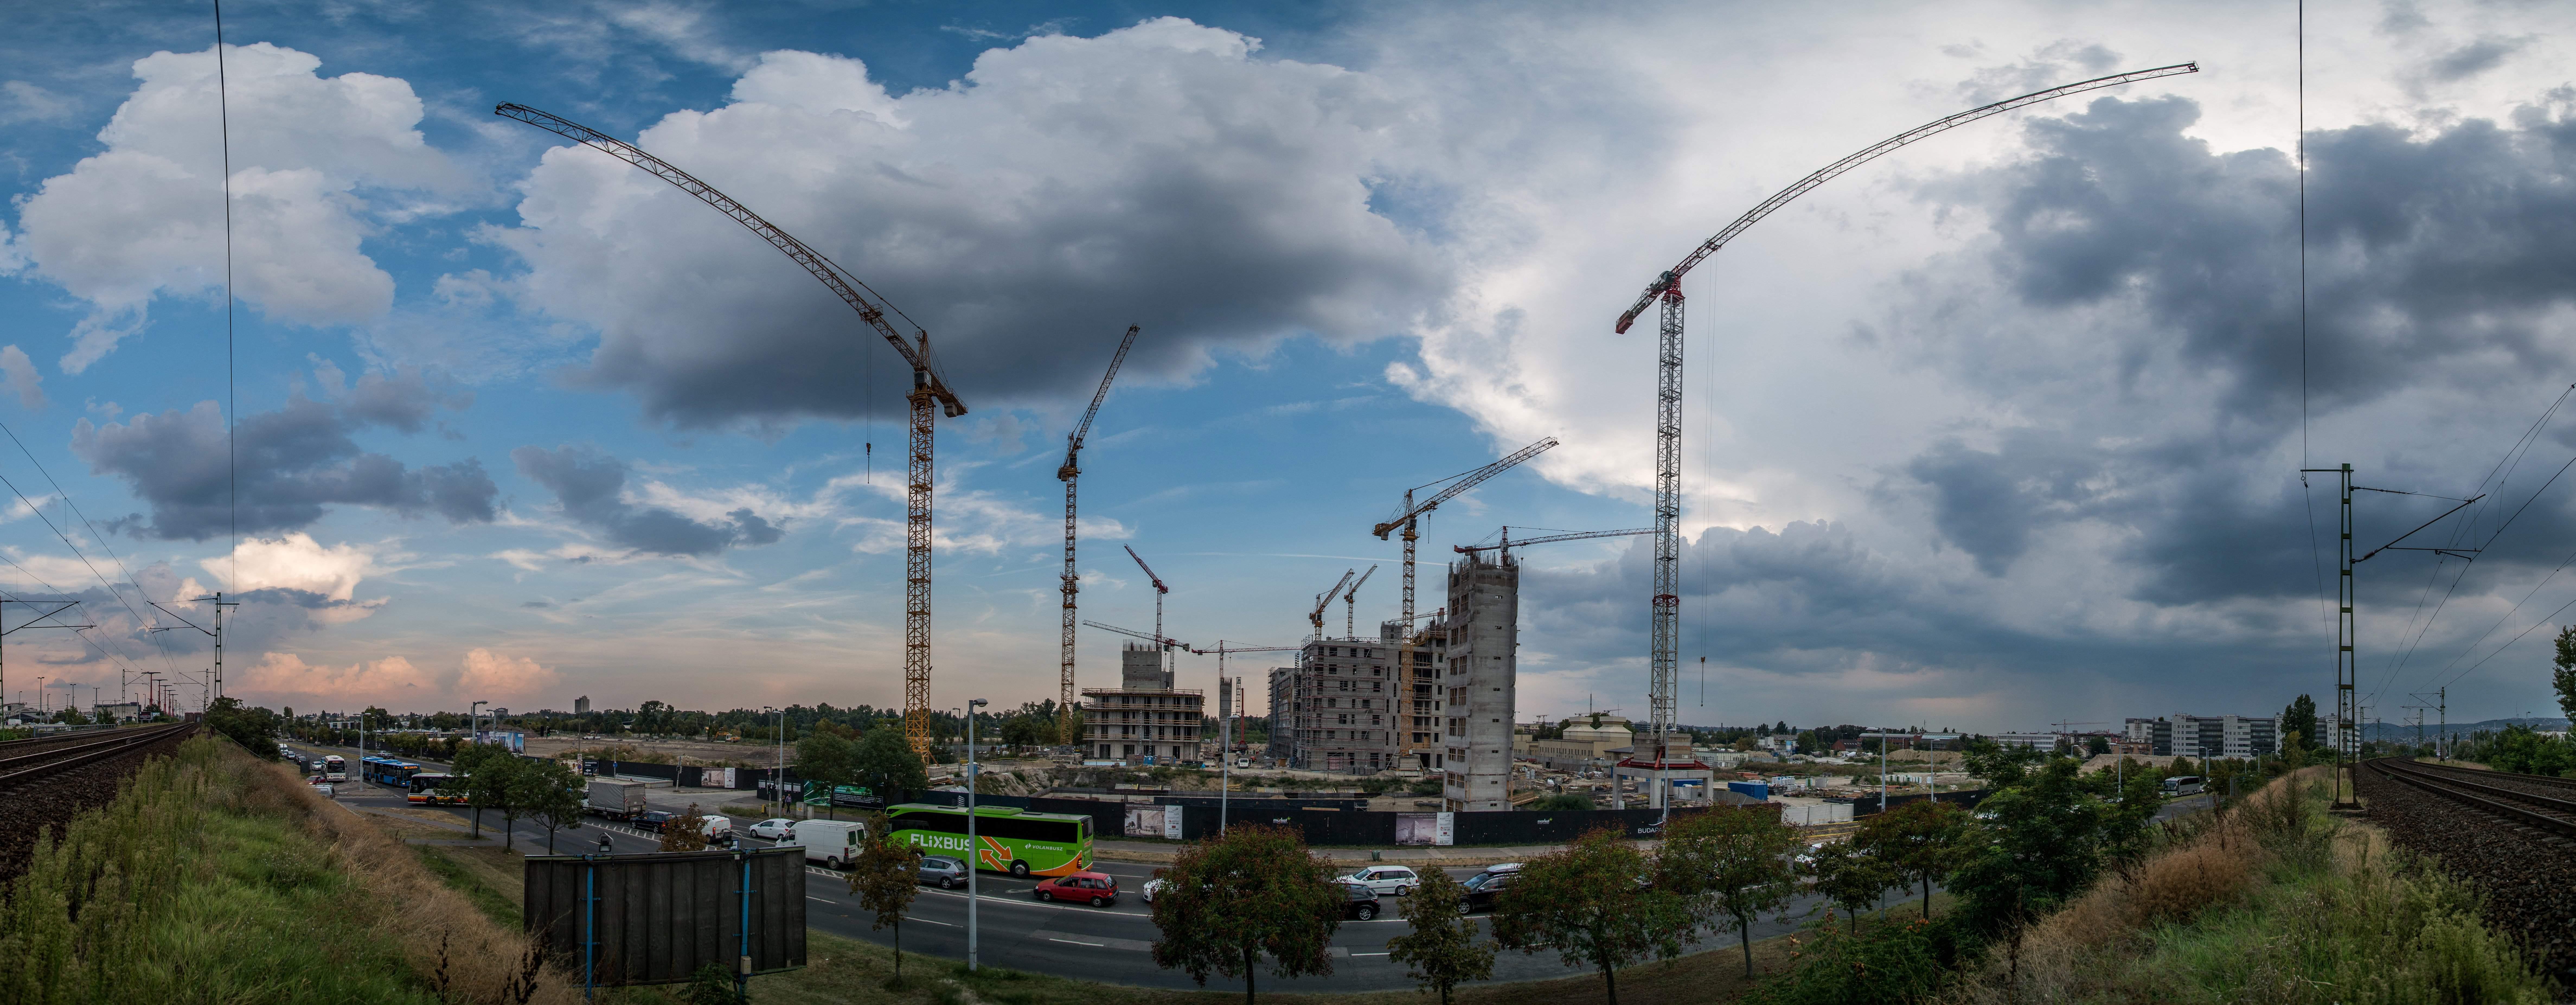 BudaPartGate construction flats